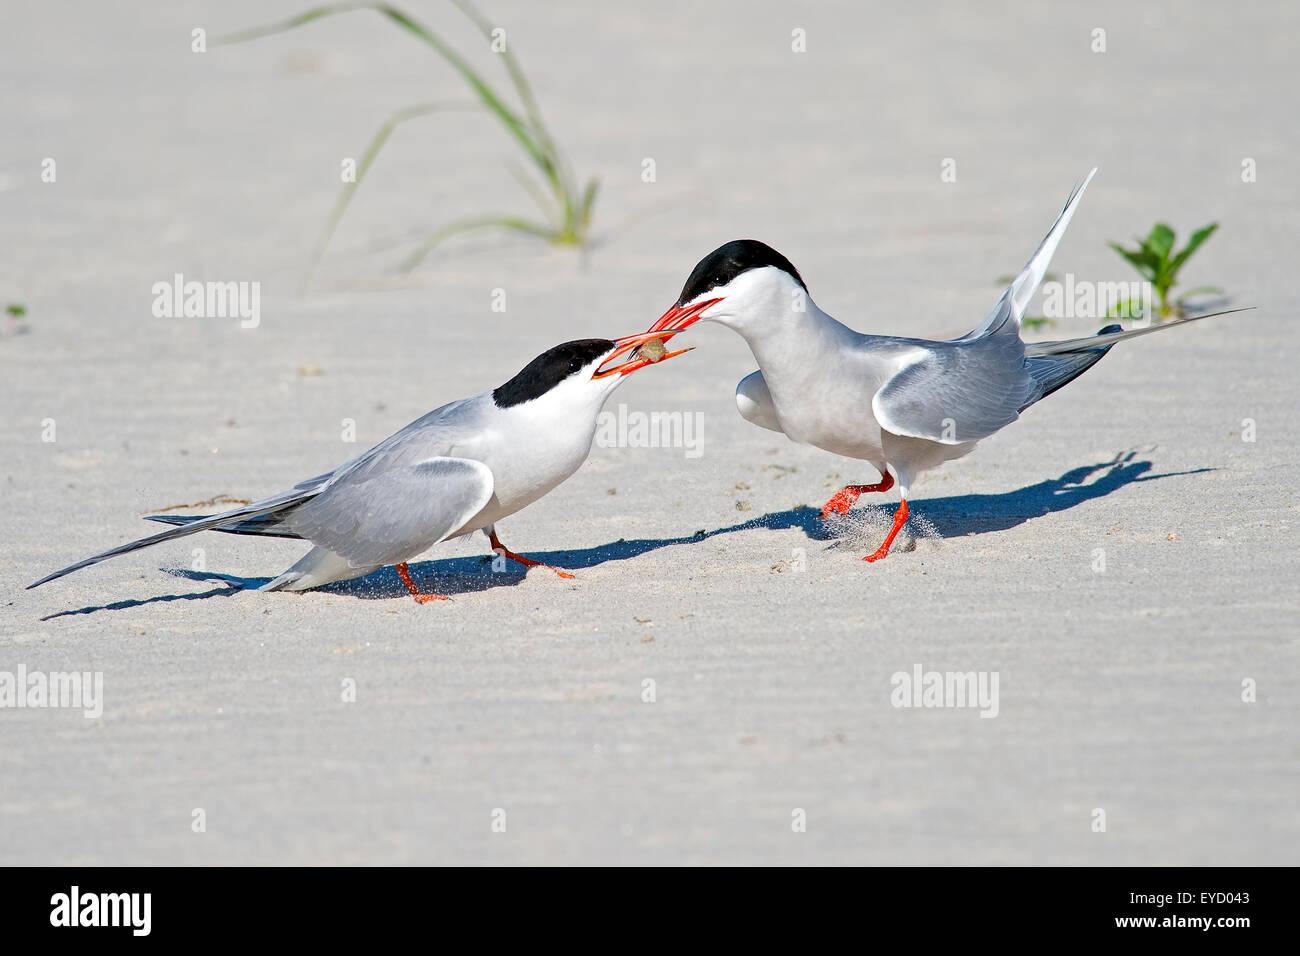 Common Tern Mating Ritual over Fish - Stock Image